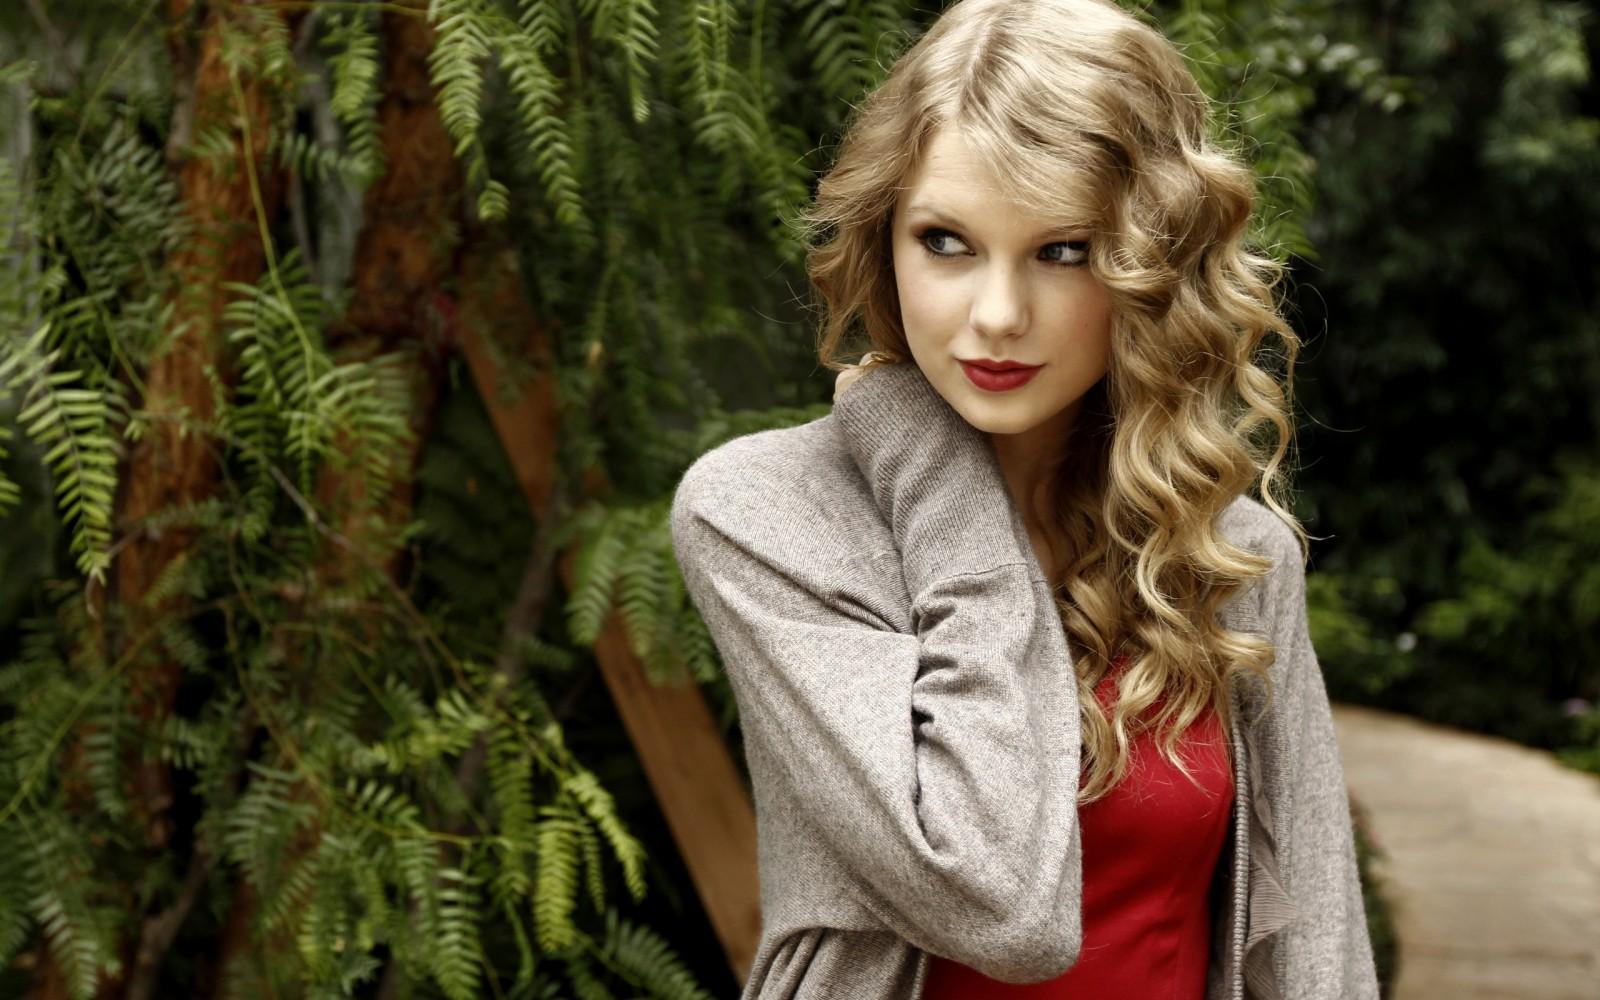 Taylor Swift 2013 wallpaper HD Wallpaper 1600x1000